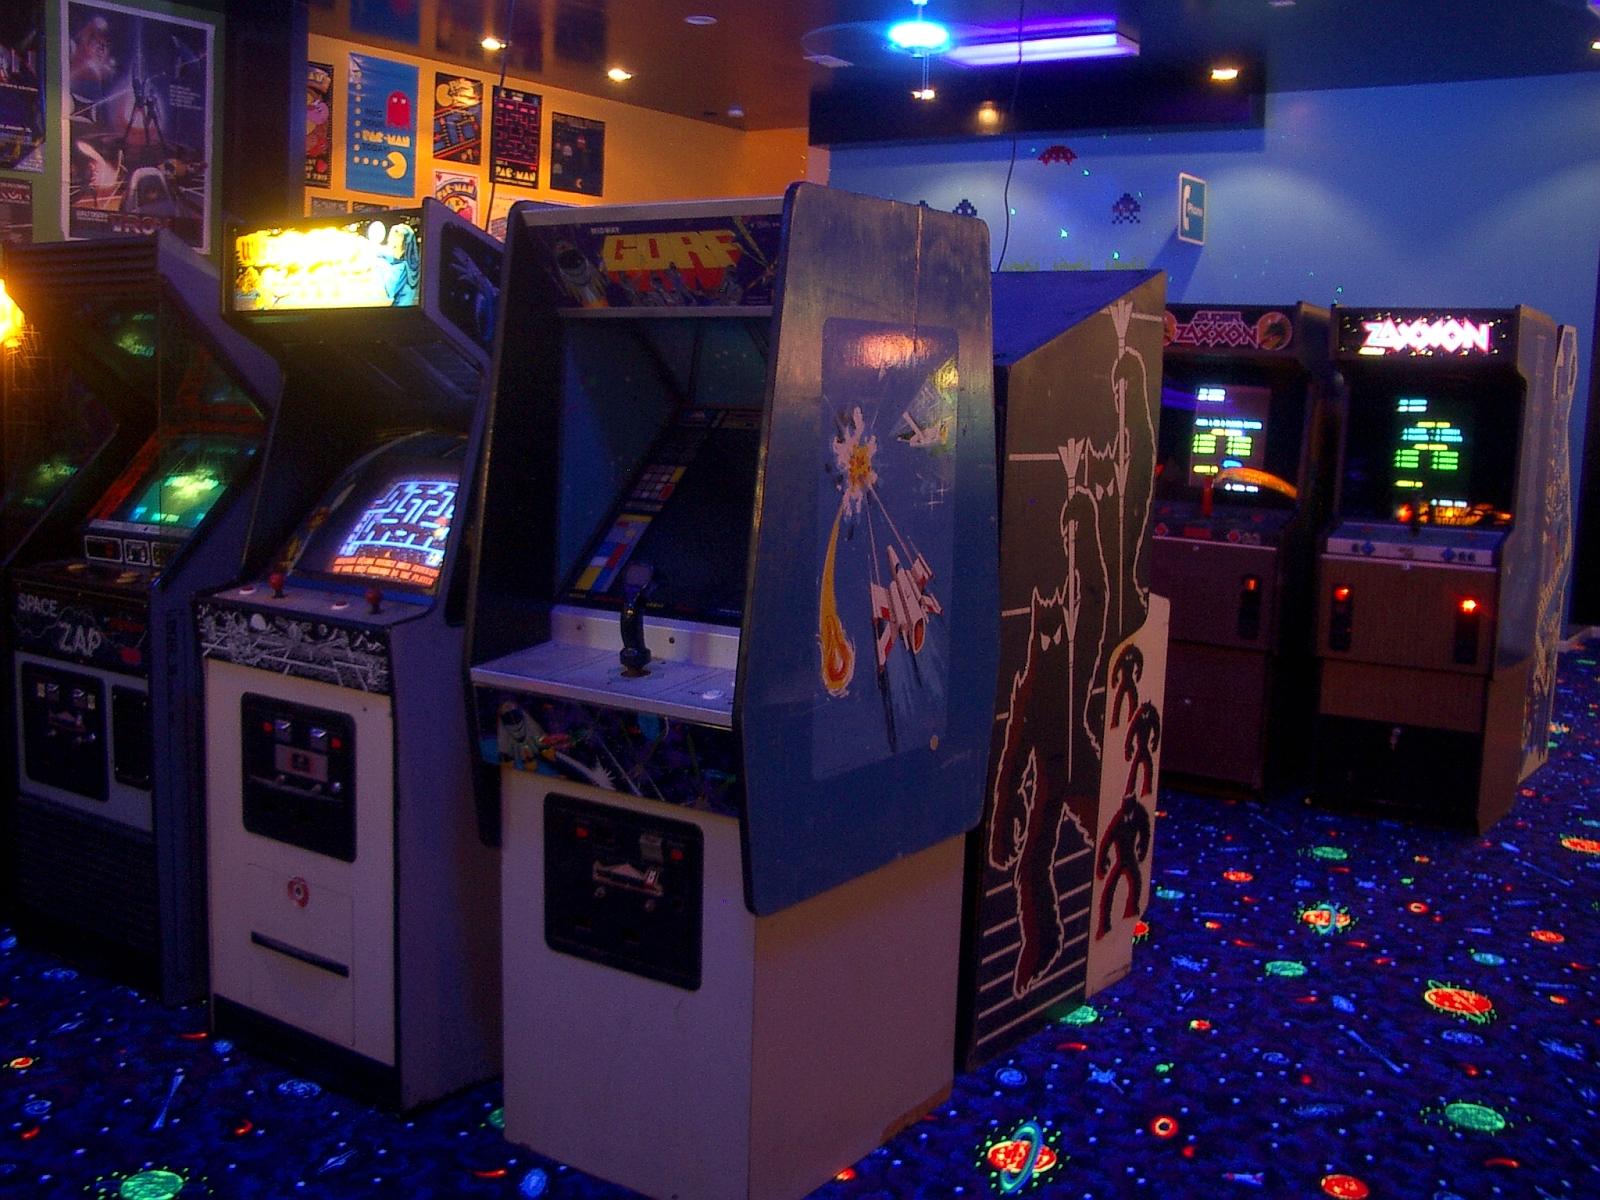 Arcade Wallpaper Video game   arcade wallpapers 1600x1200